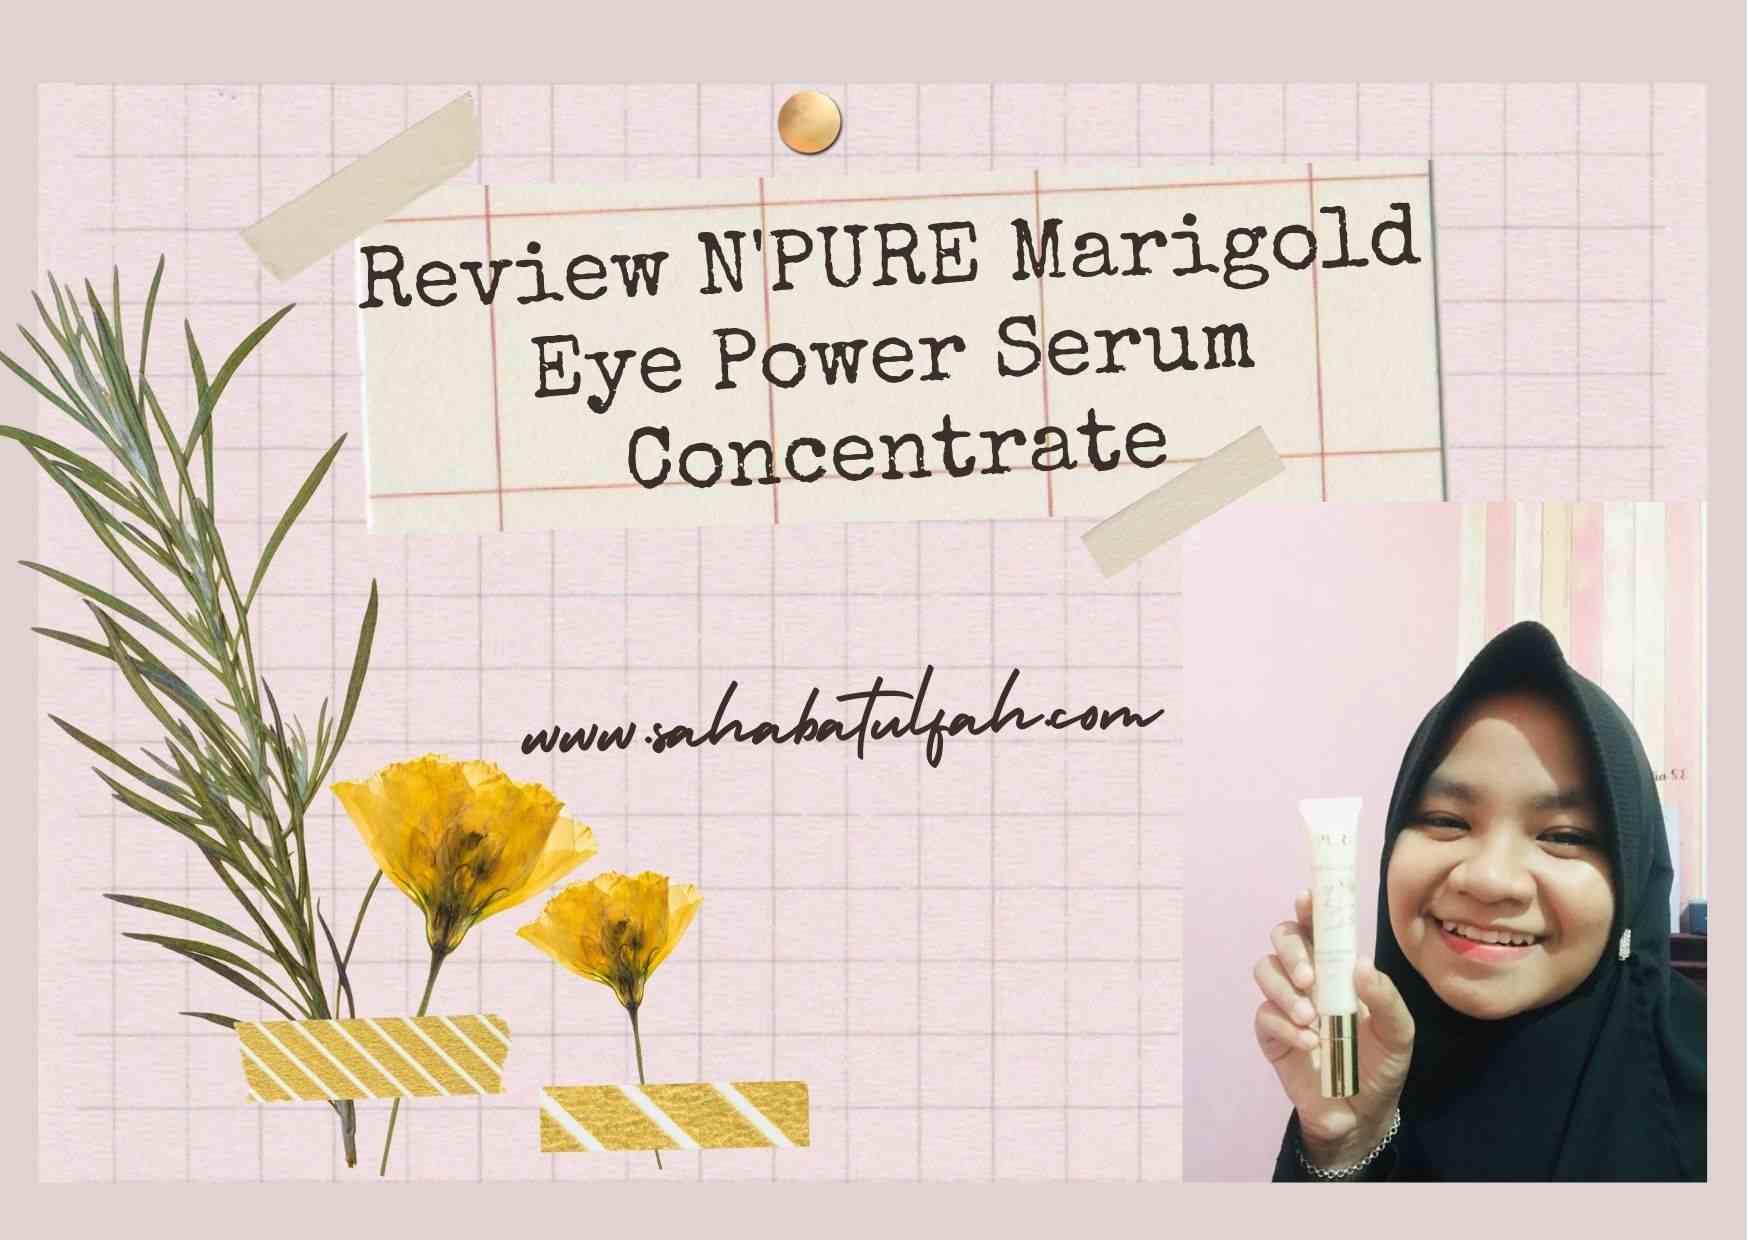 Review-N'PURE-Marigold-Eye-Serum